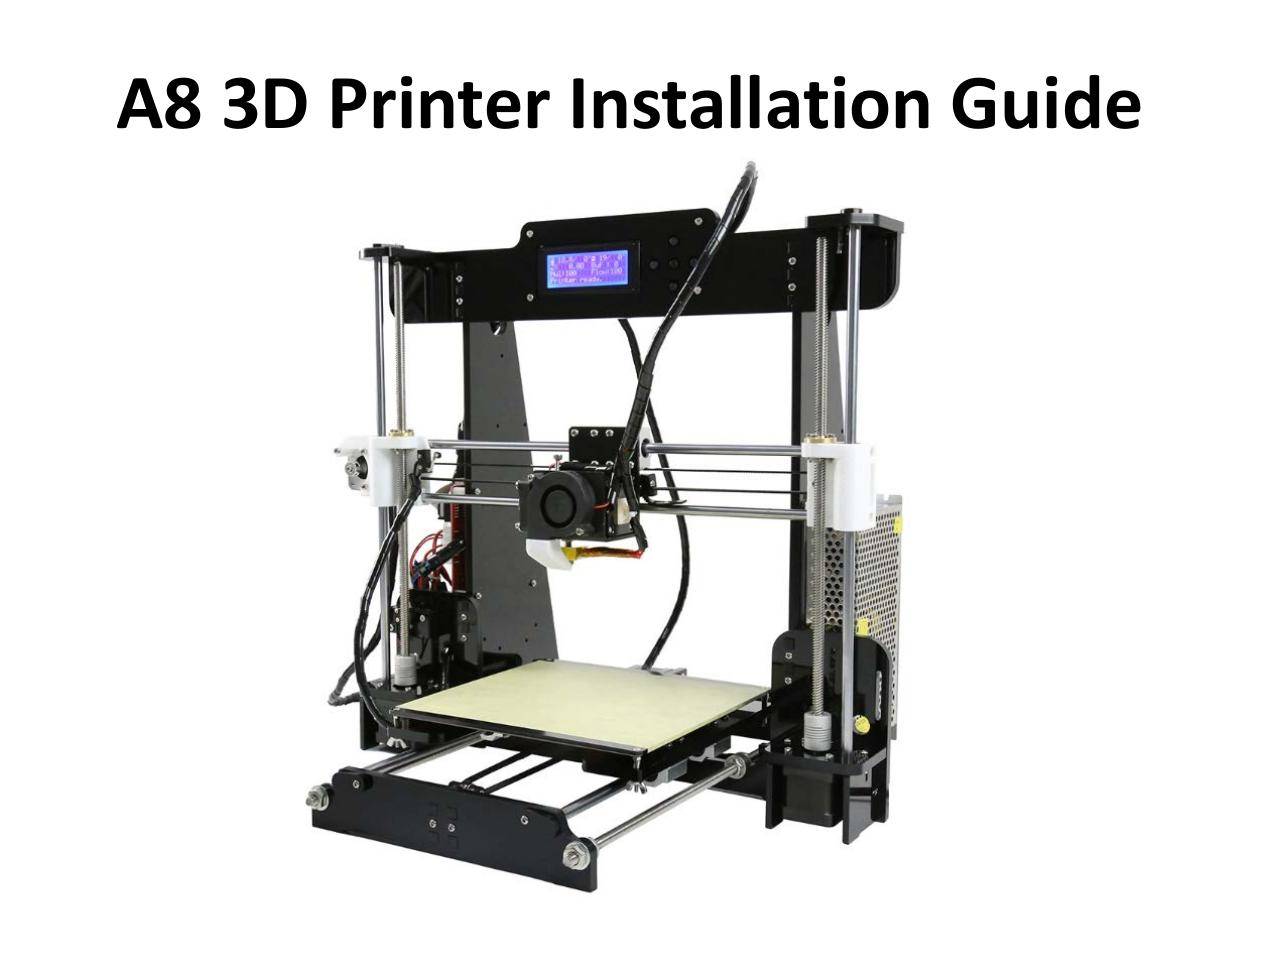 A8 3D Printer Installation Instructions par Administrator ...